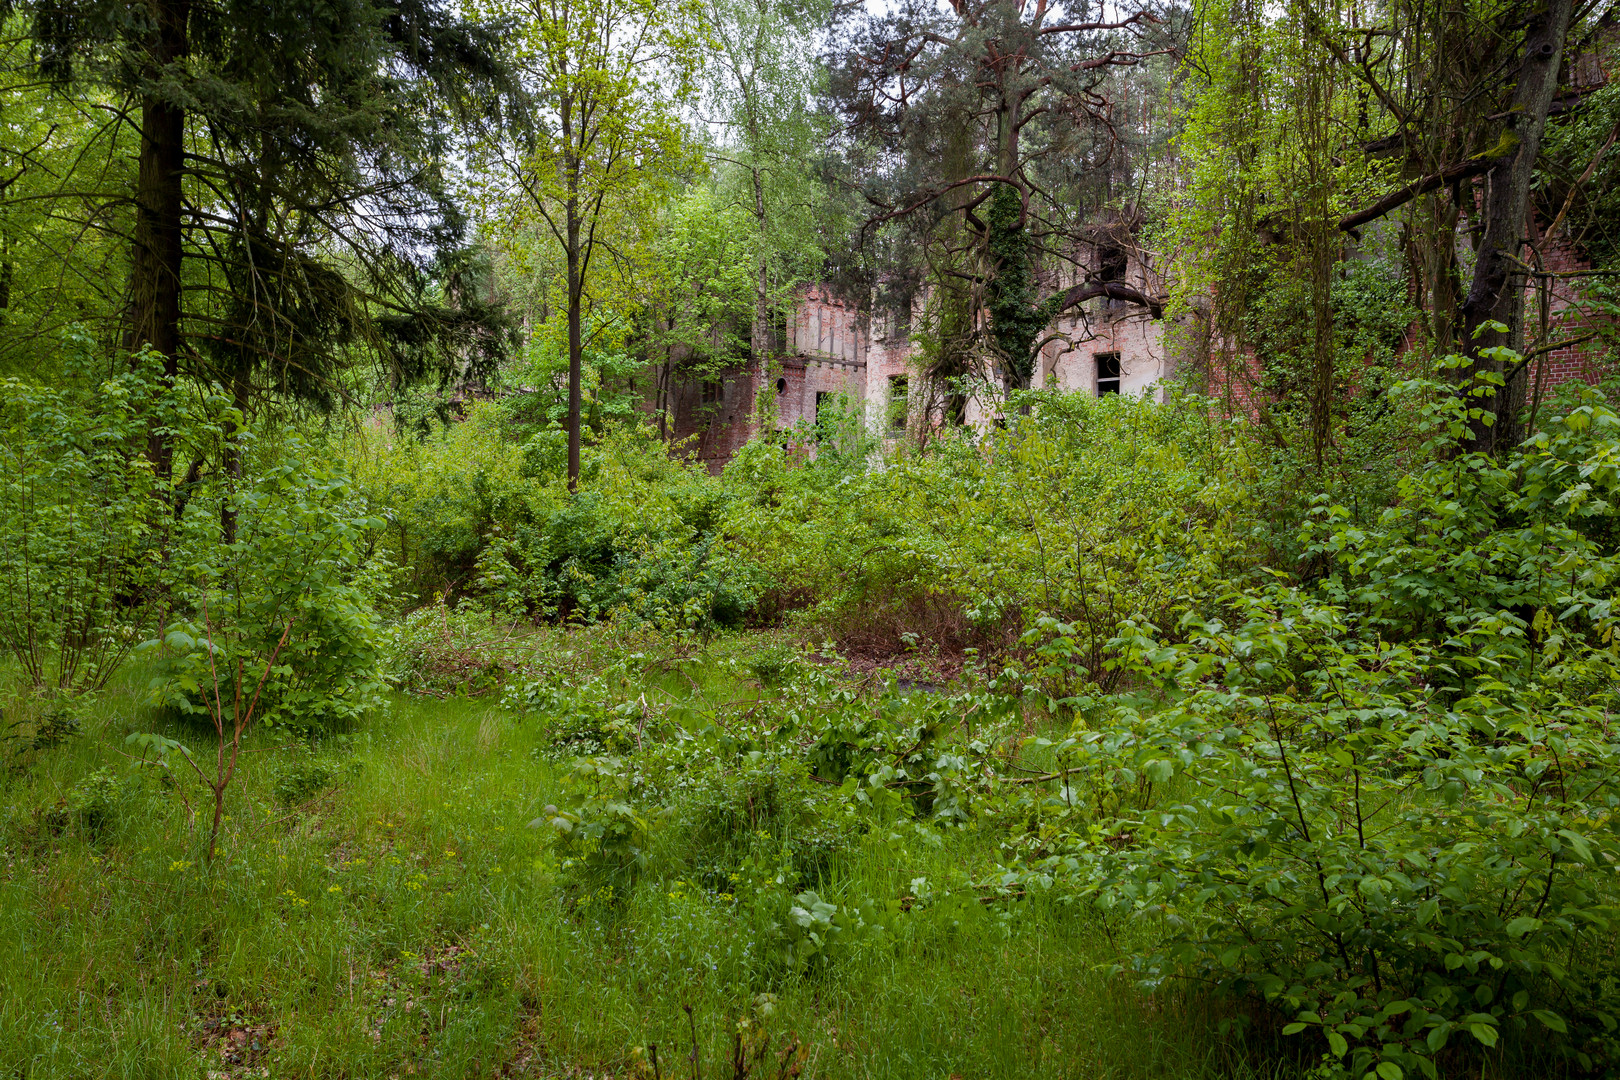 Beelitz Heilstätten - Frauenlungenheilstätte Alpenhaus (4)